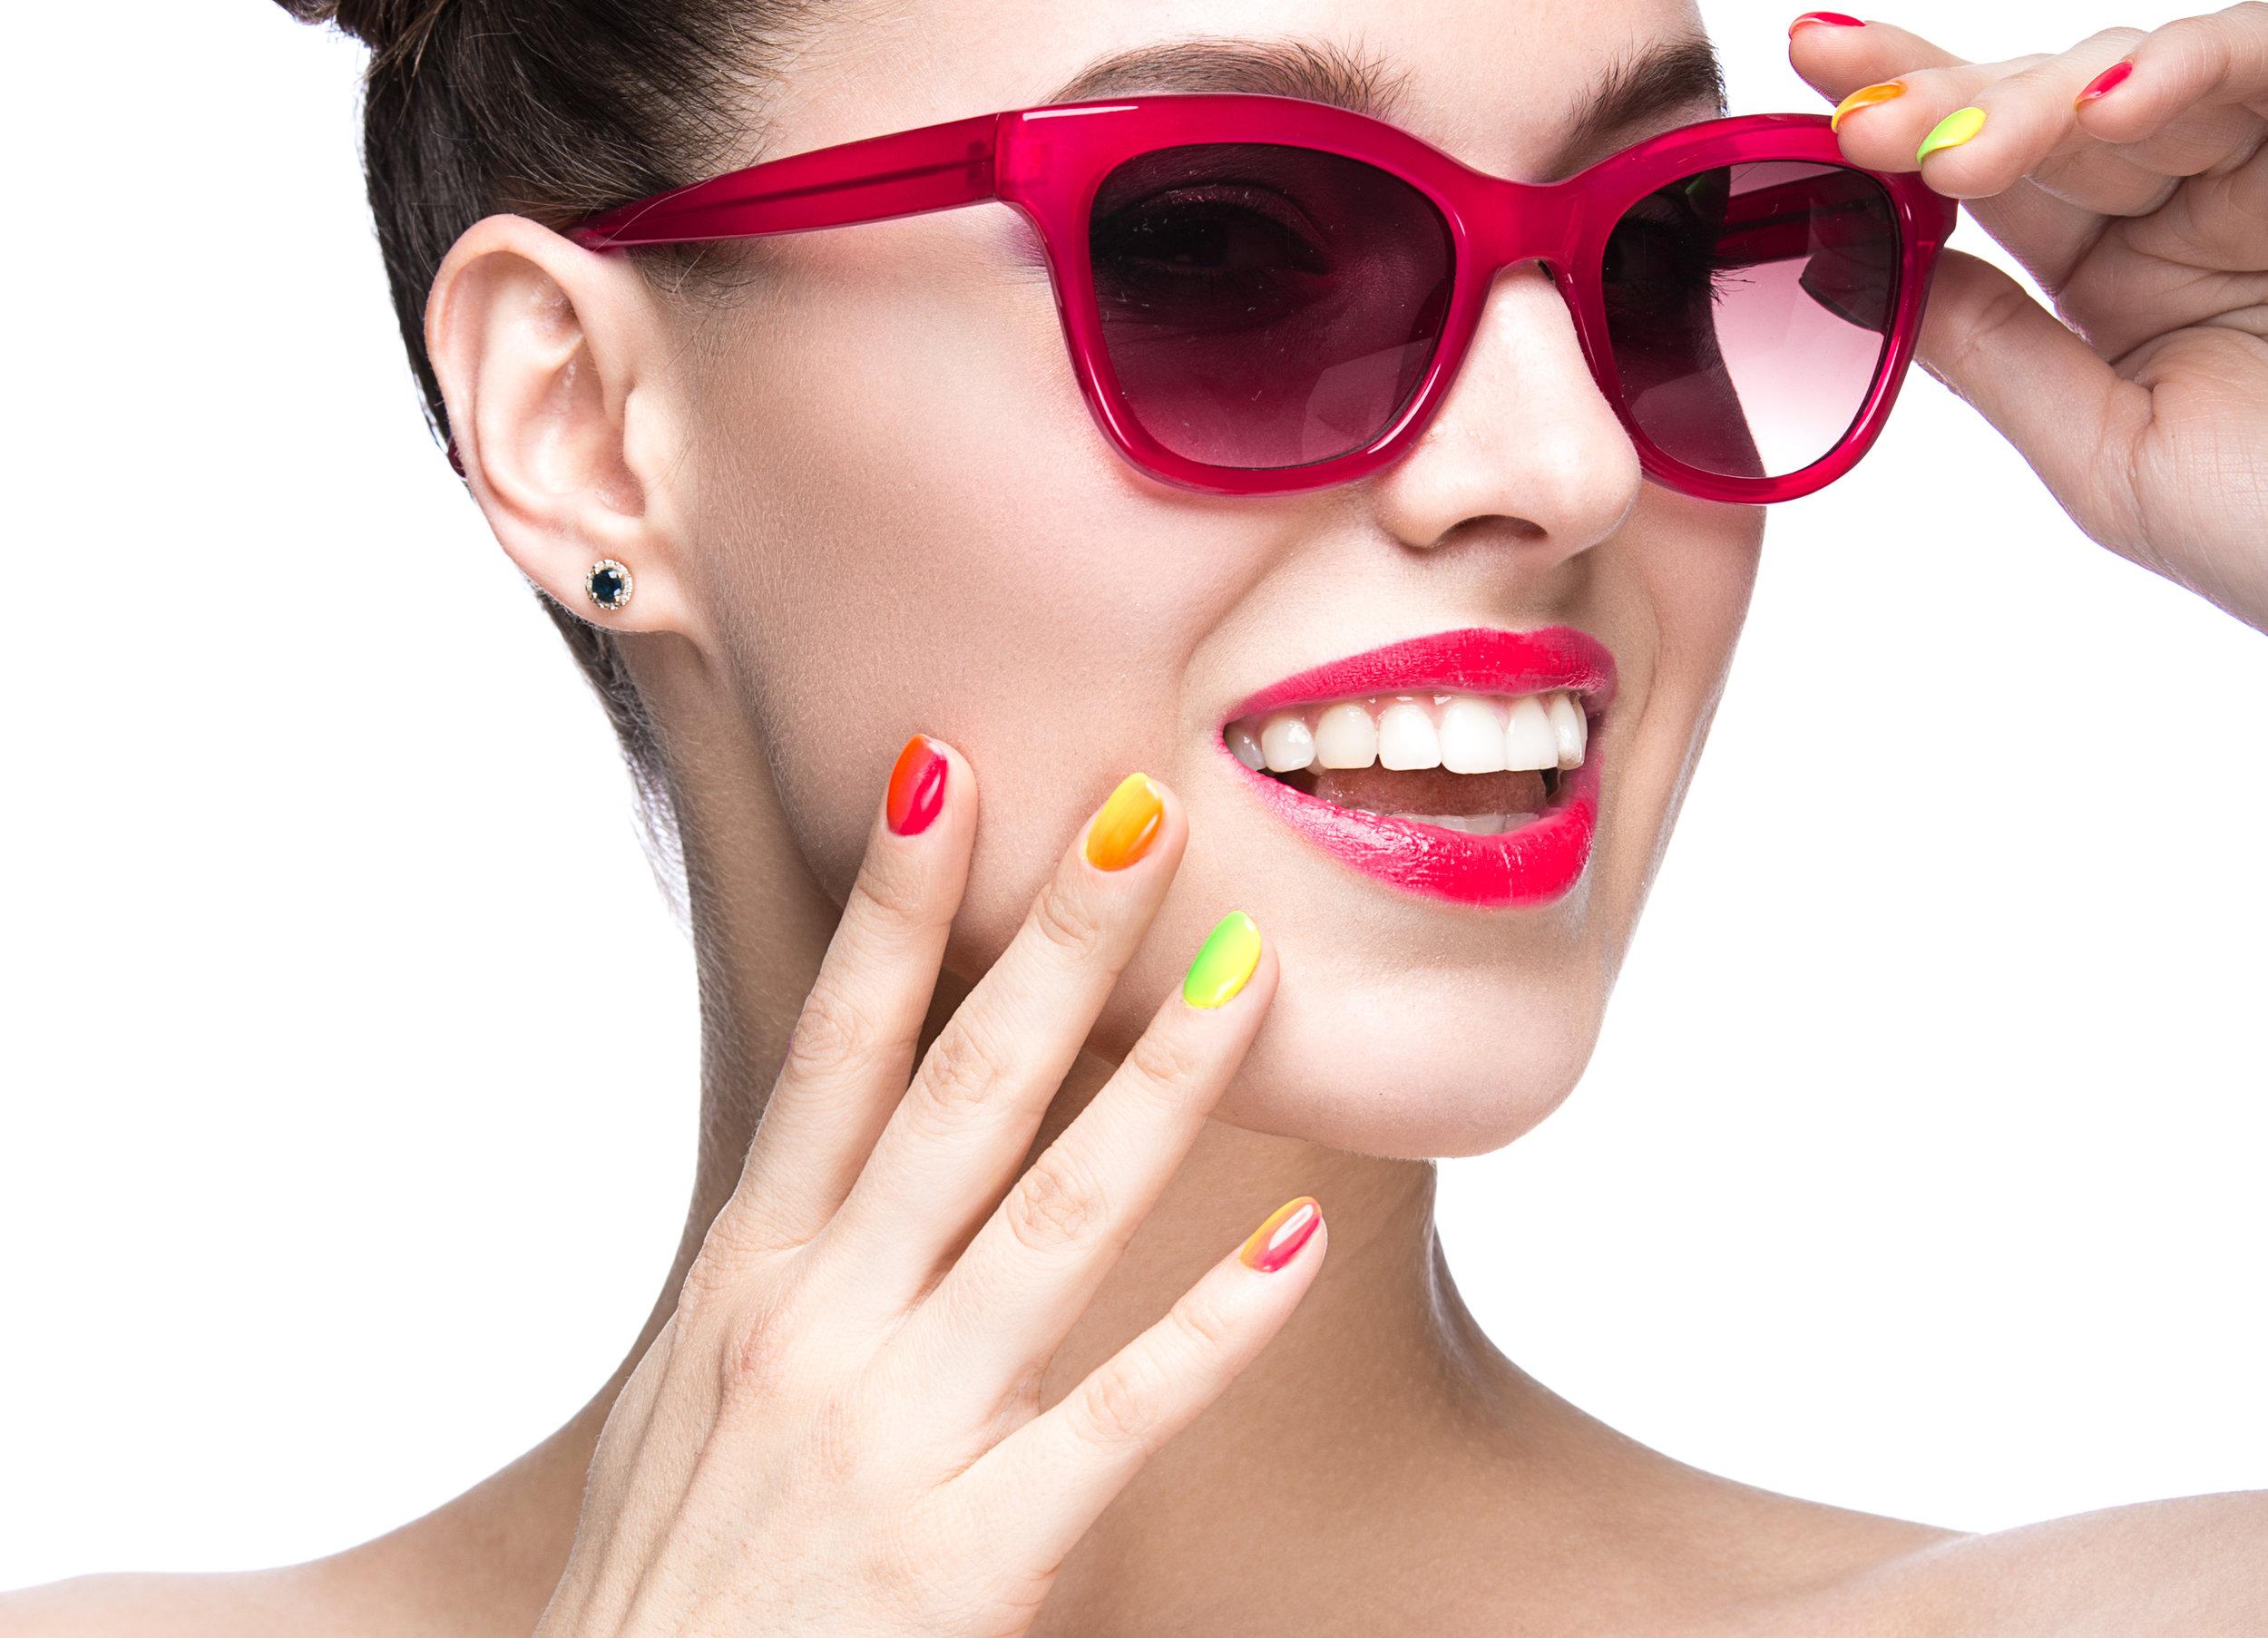 nails, manicure, pedicure, file and polish, shellac, vinylux,